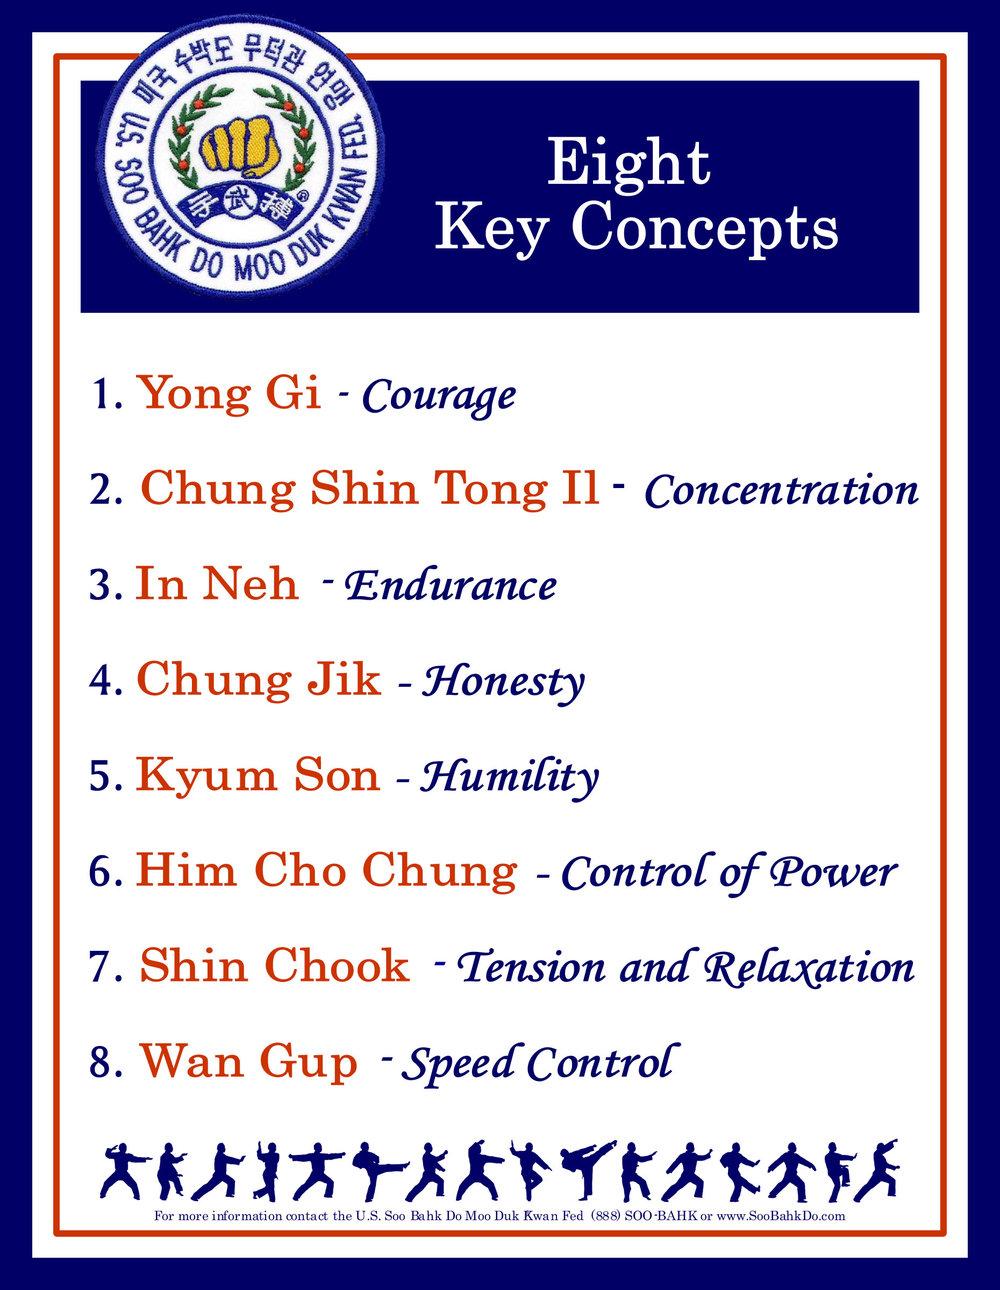 8keyconcepts.jpg